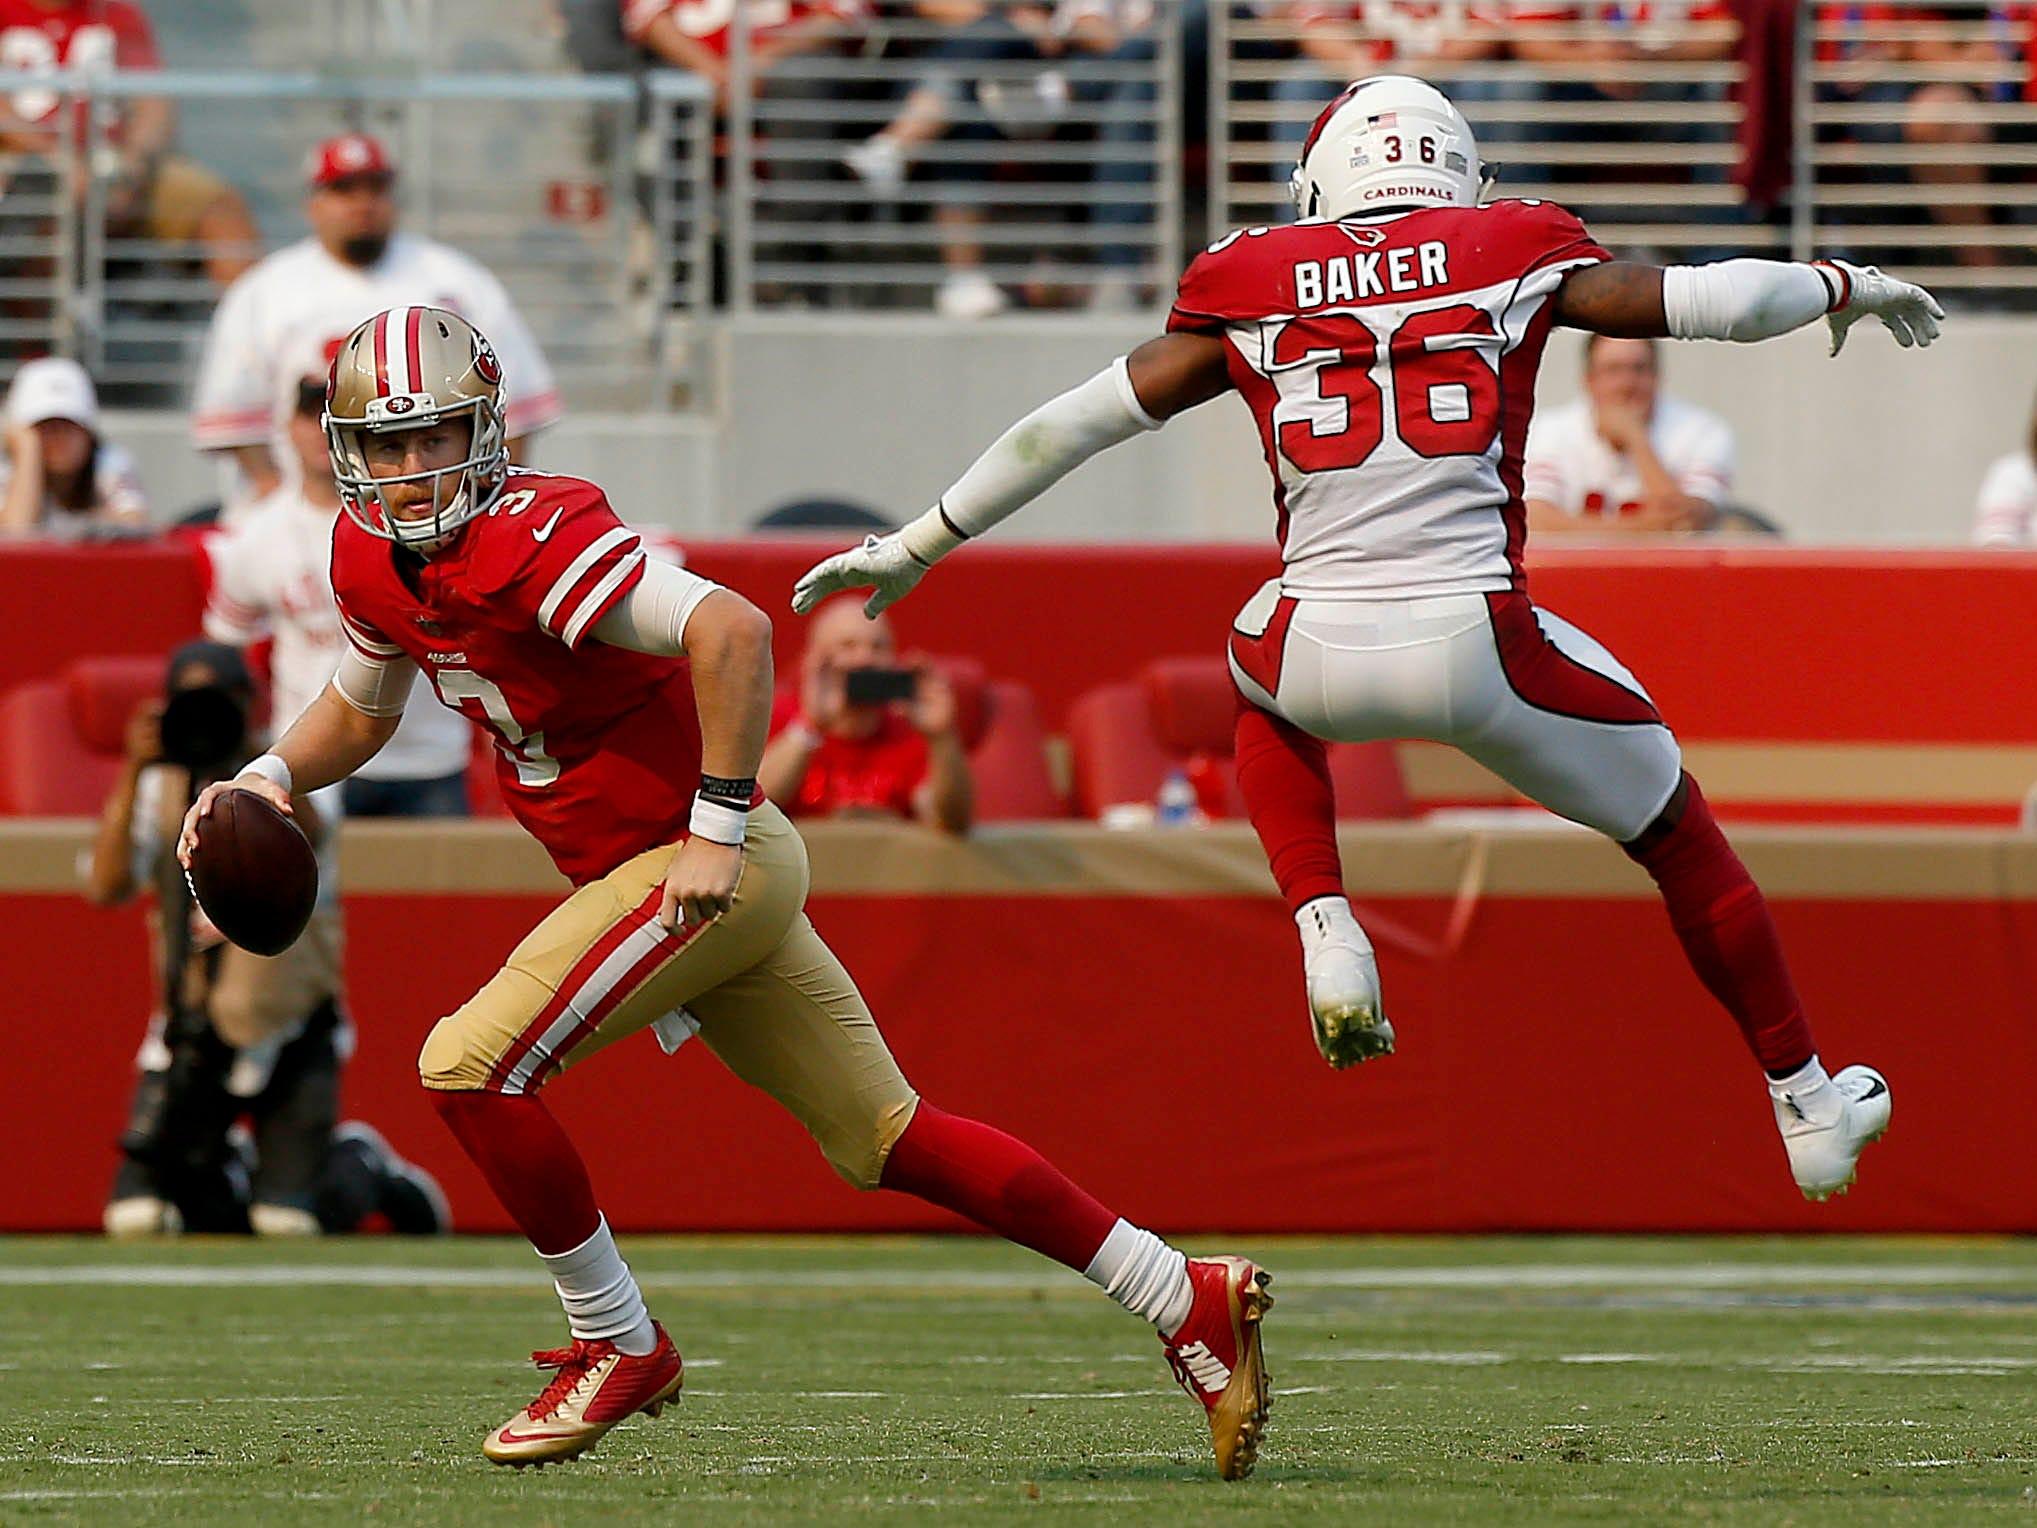 Oct 7, 2018; Santa Clara, CA, USA; San Francisco 49ers quarterback C.J. Beathard (3) eludes Arizona Cardinals defensive back Budda Baker (36) in the second quarter at Levi's Stadium.